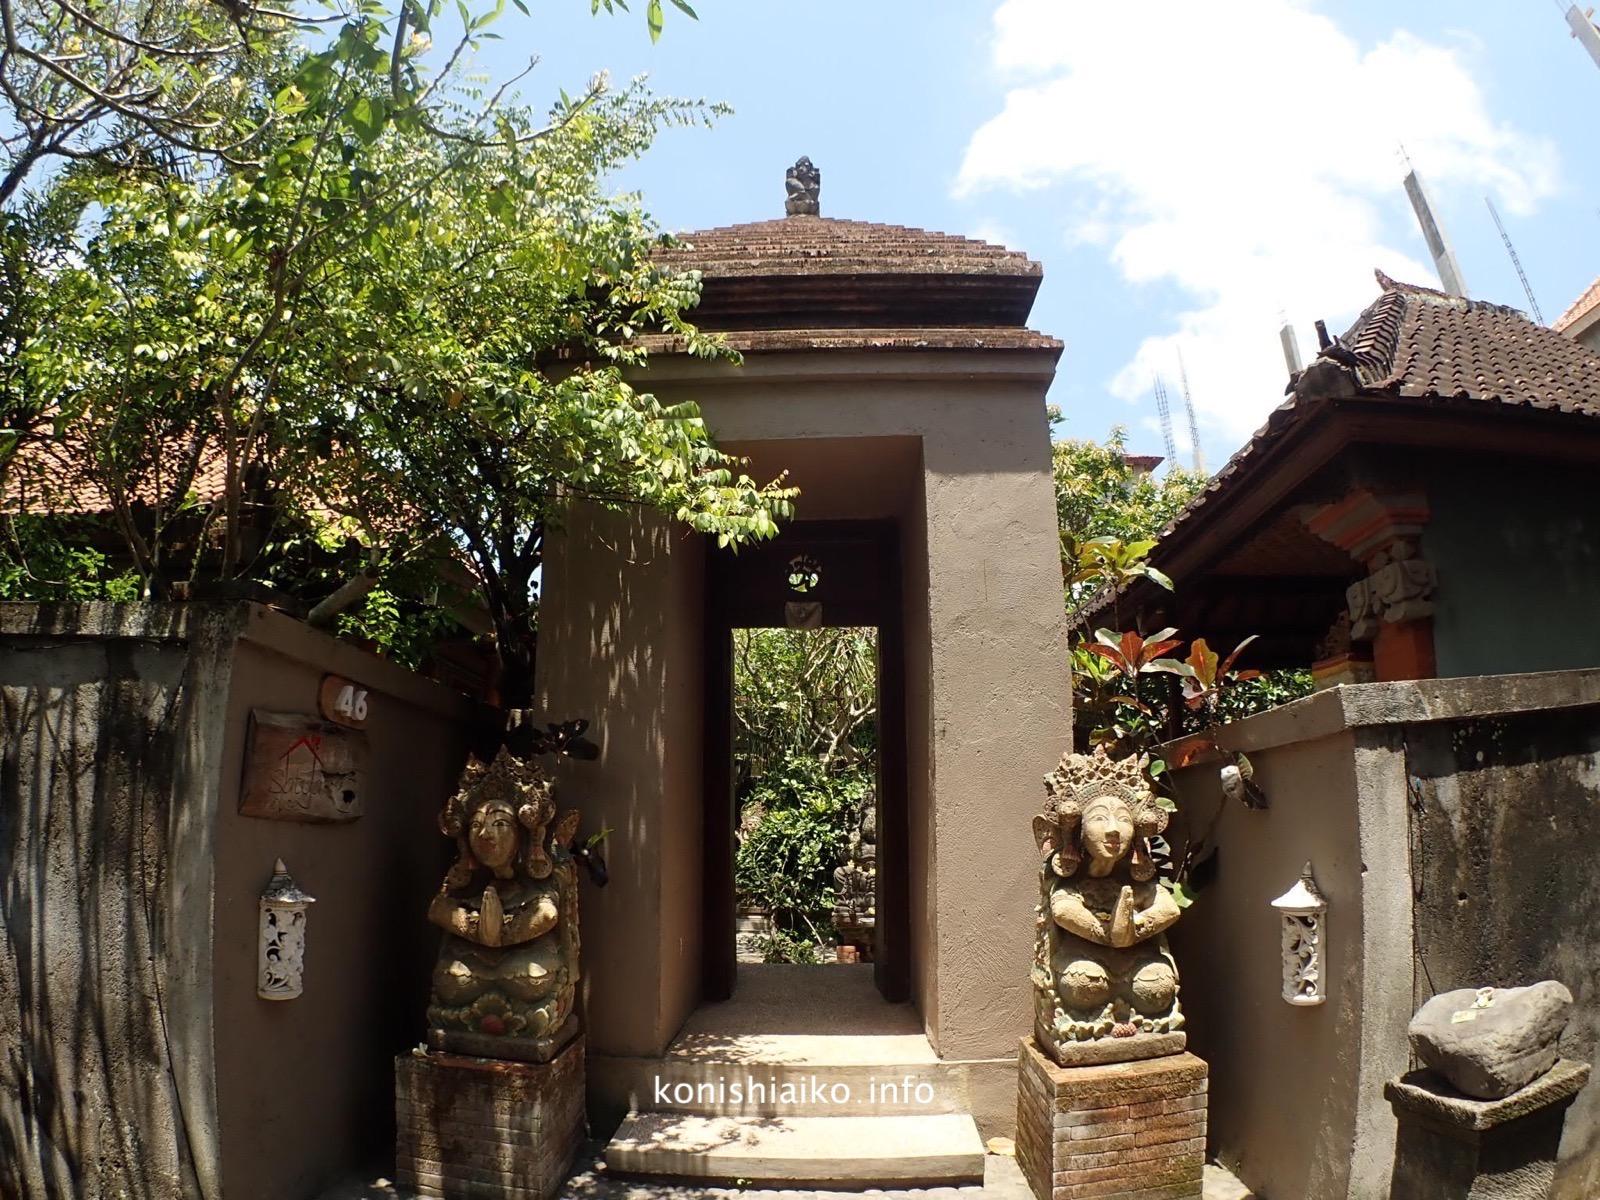 Satya house入り口